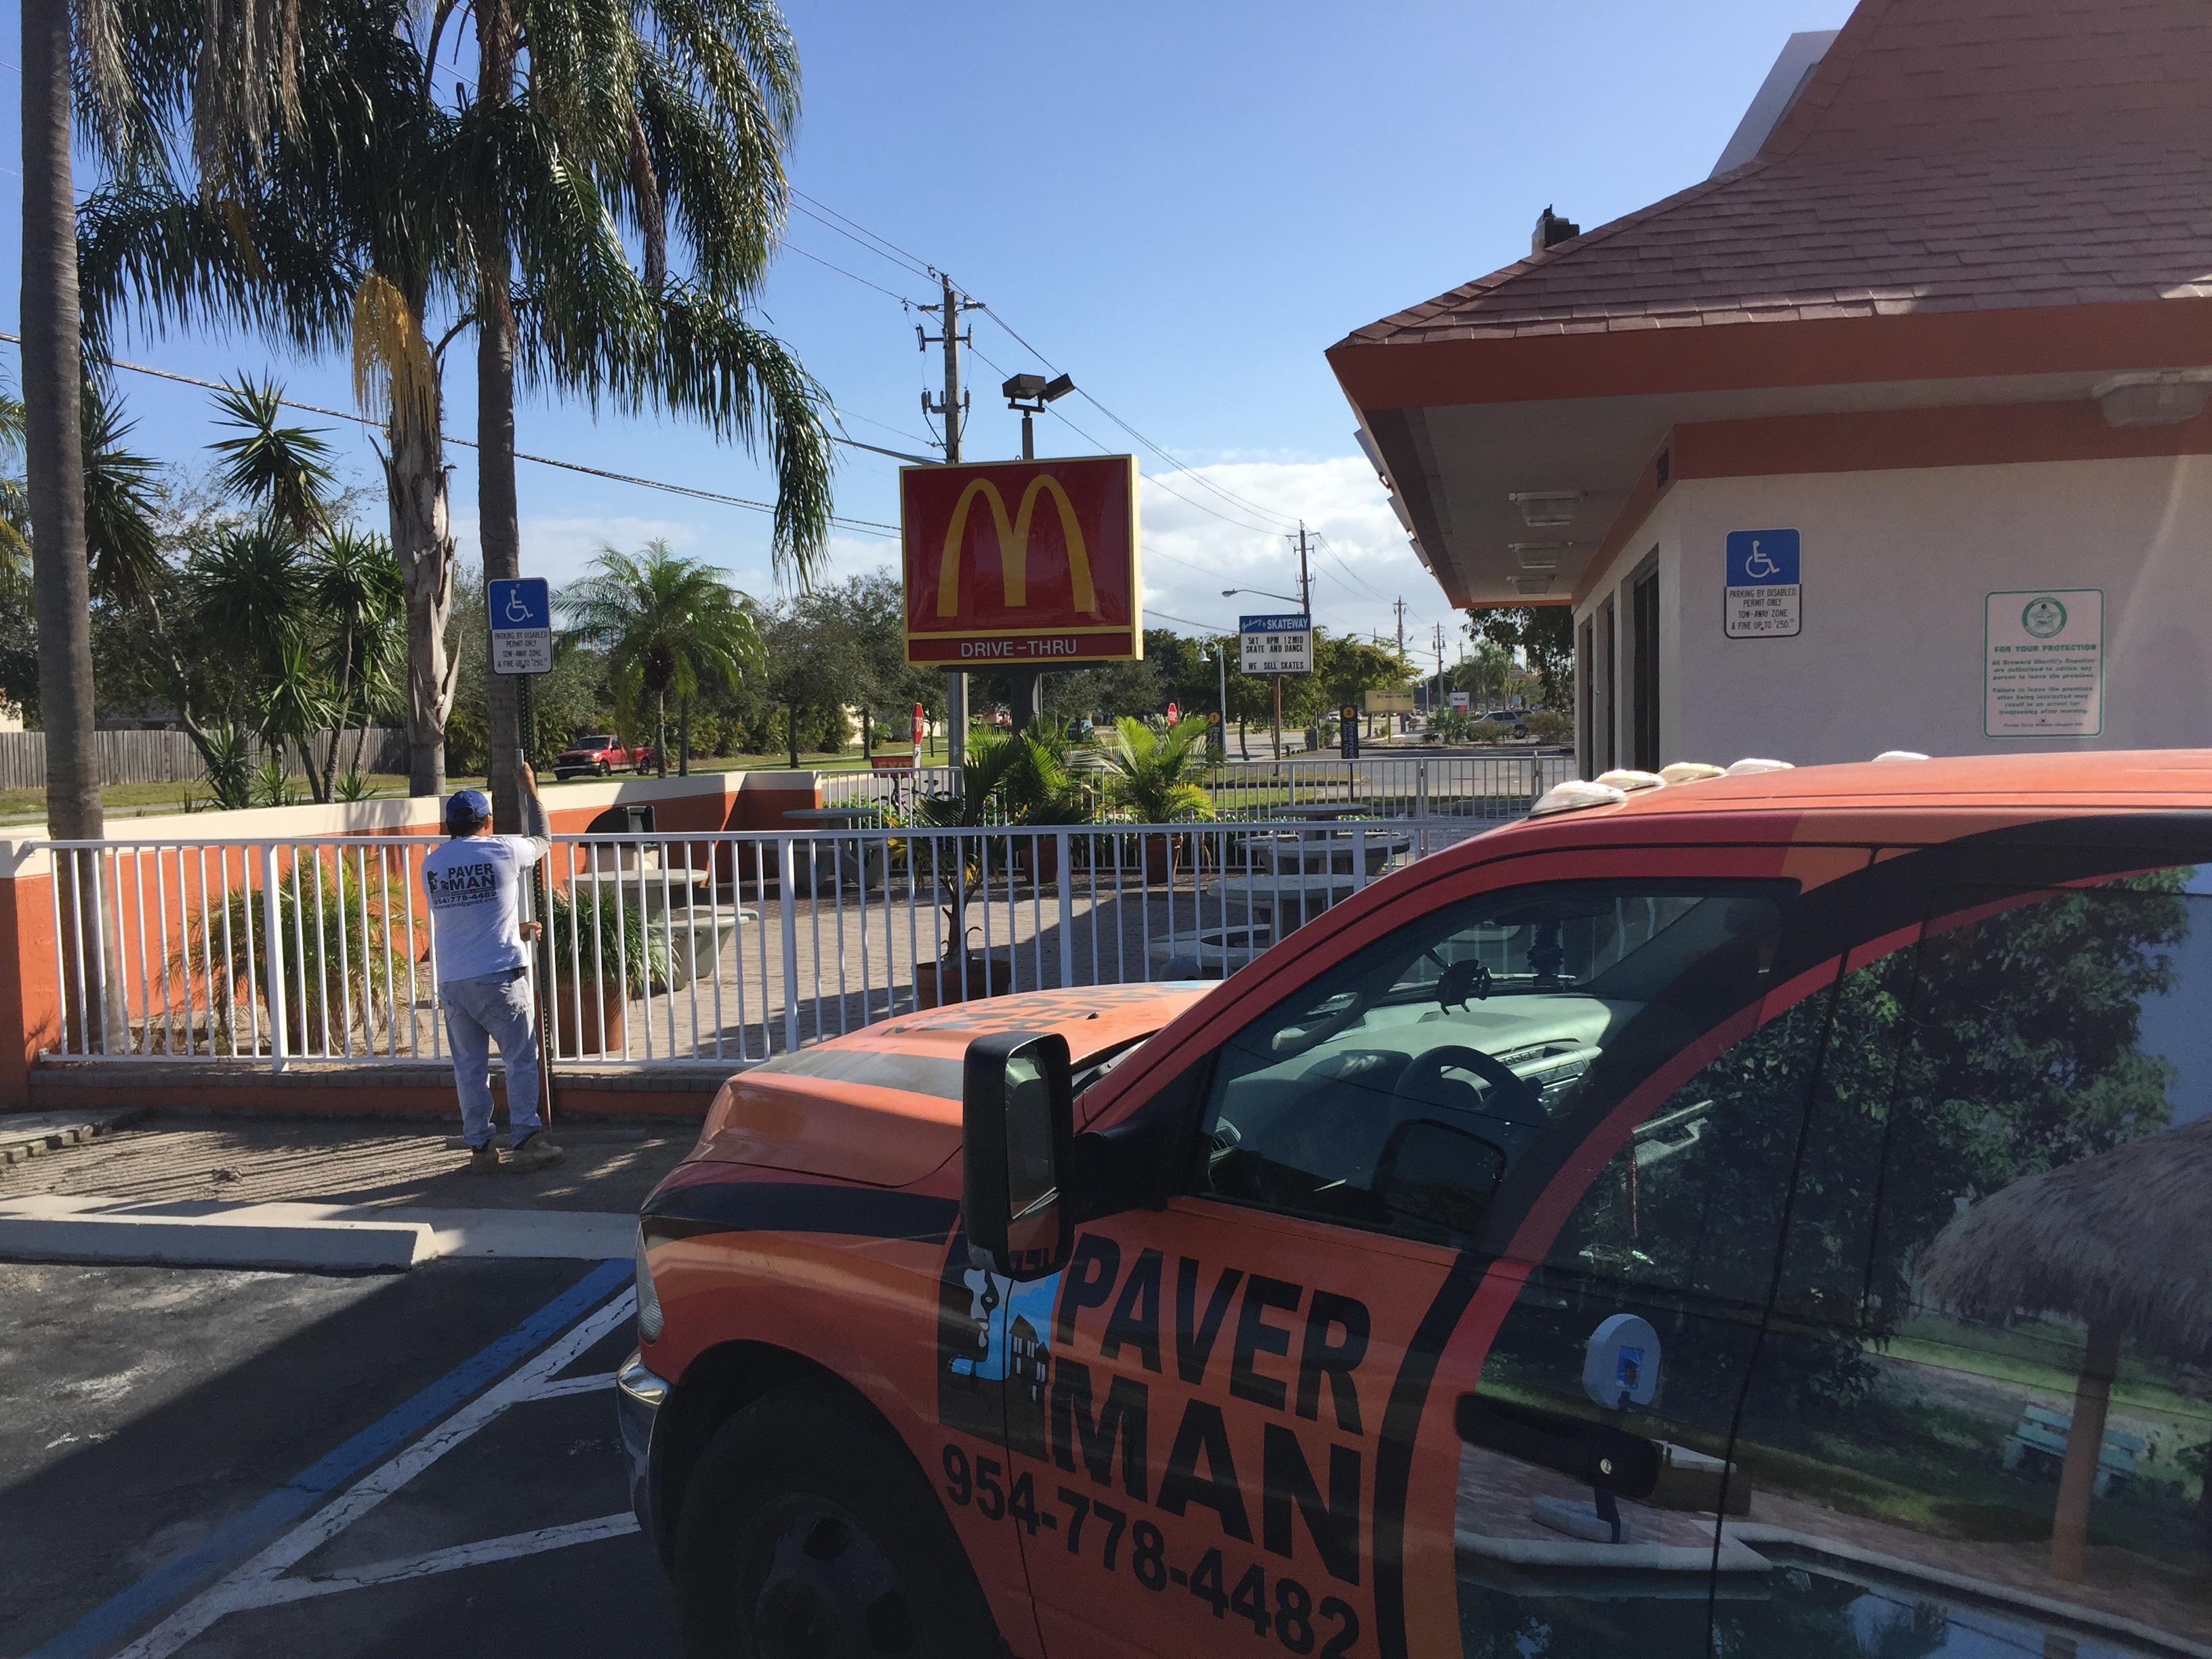 Paver Man Fort Lauderdale